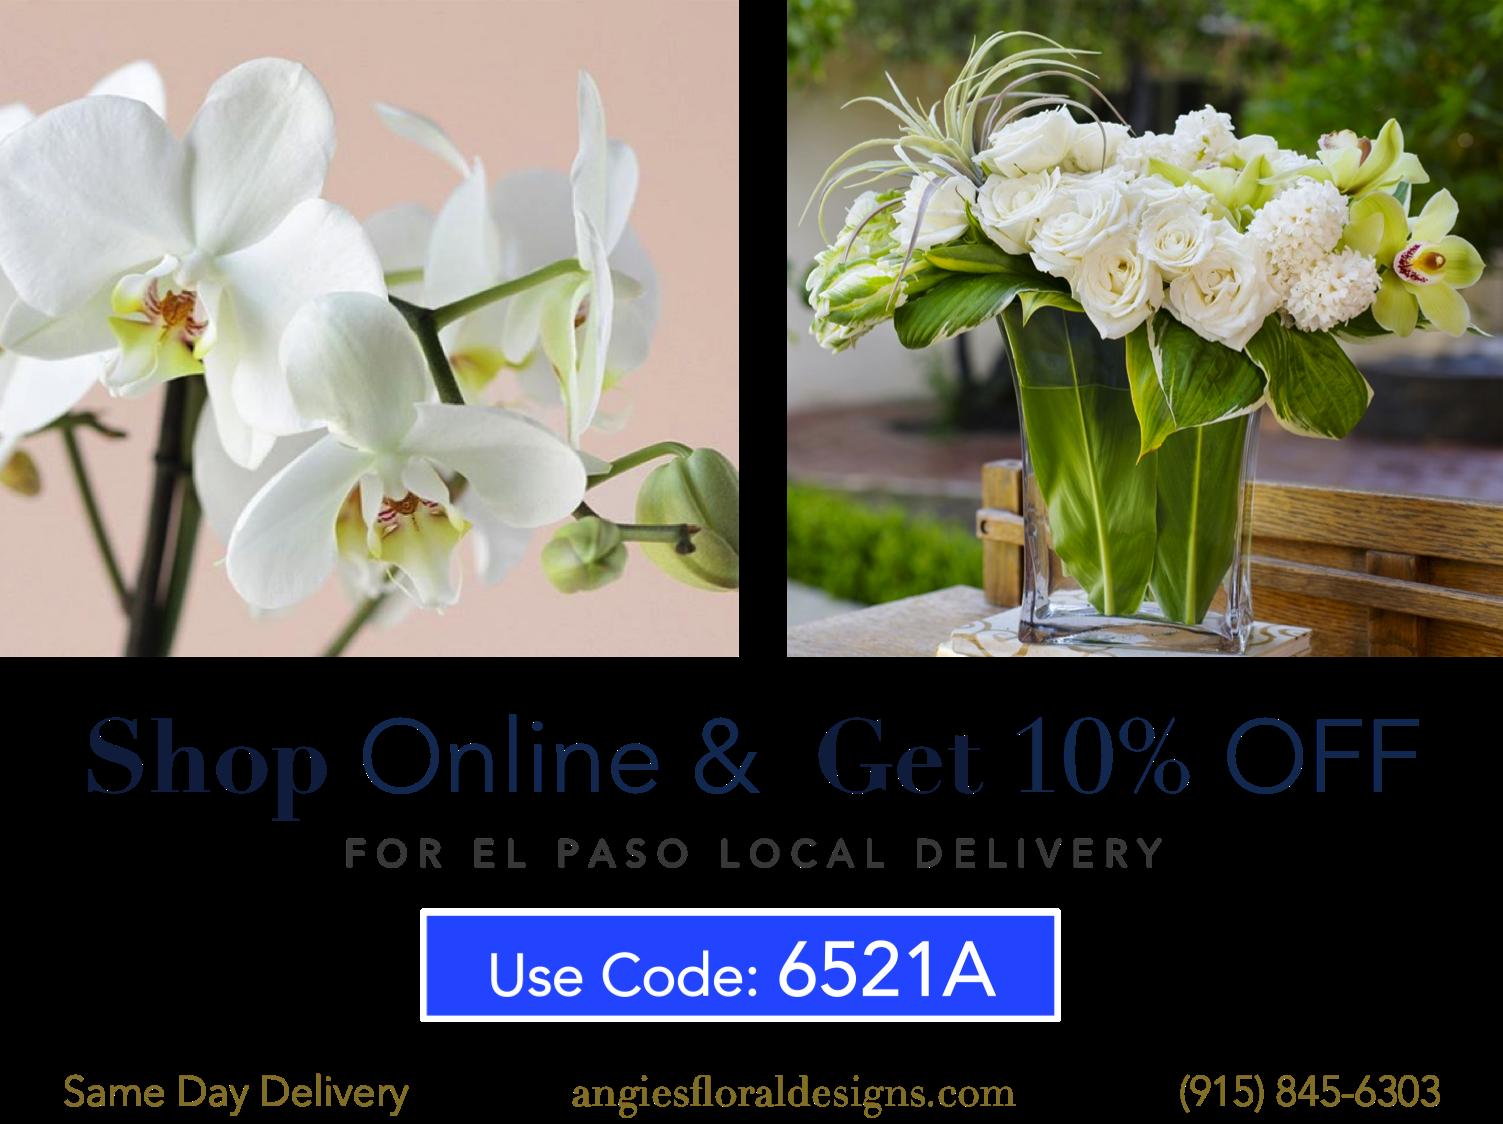 0-angies-floral-desig-n-order-flowers-sympathy-online-a-n-n-iversary-send-gifts-79912-handcrafted-gifts-same-day-delivery-roses-flowershop-el-paso-texas-79912-shop-online-flowers-florist-best-florist.png